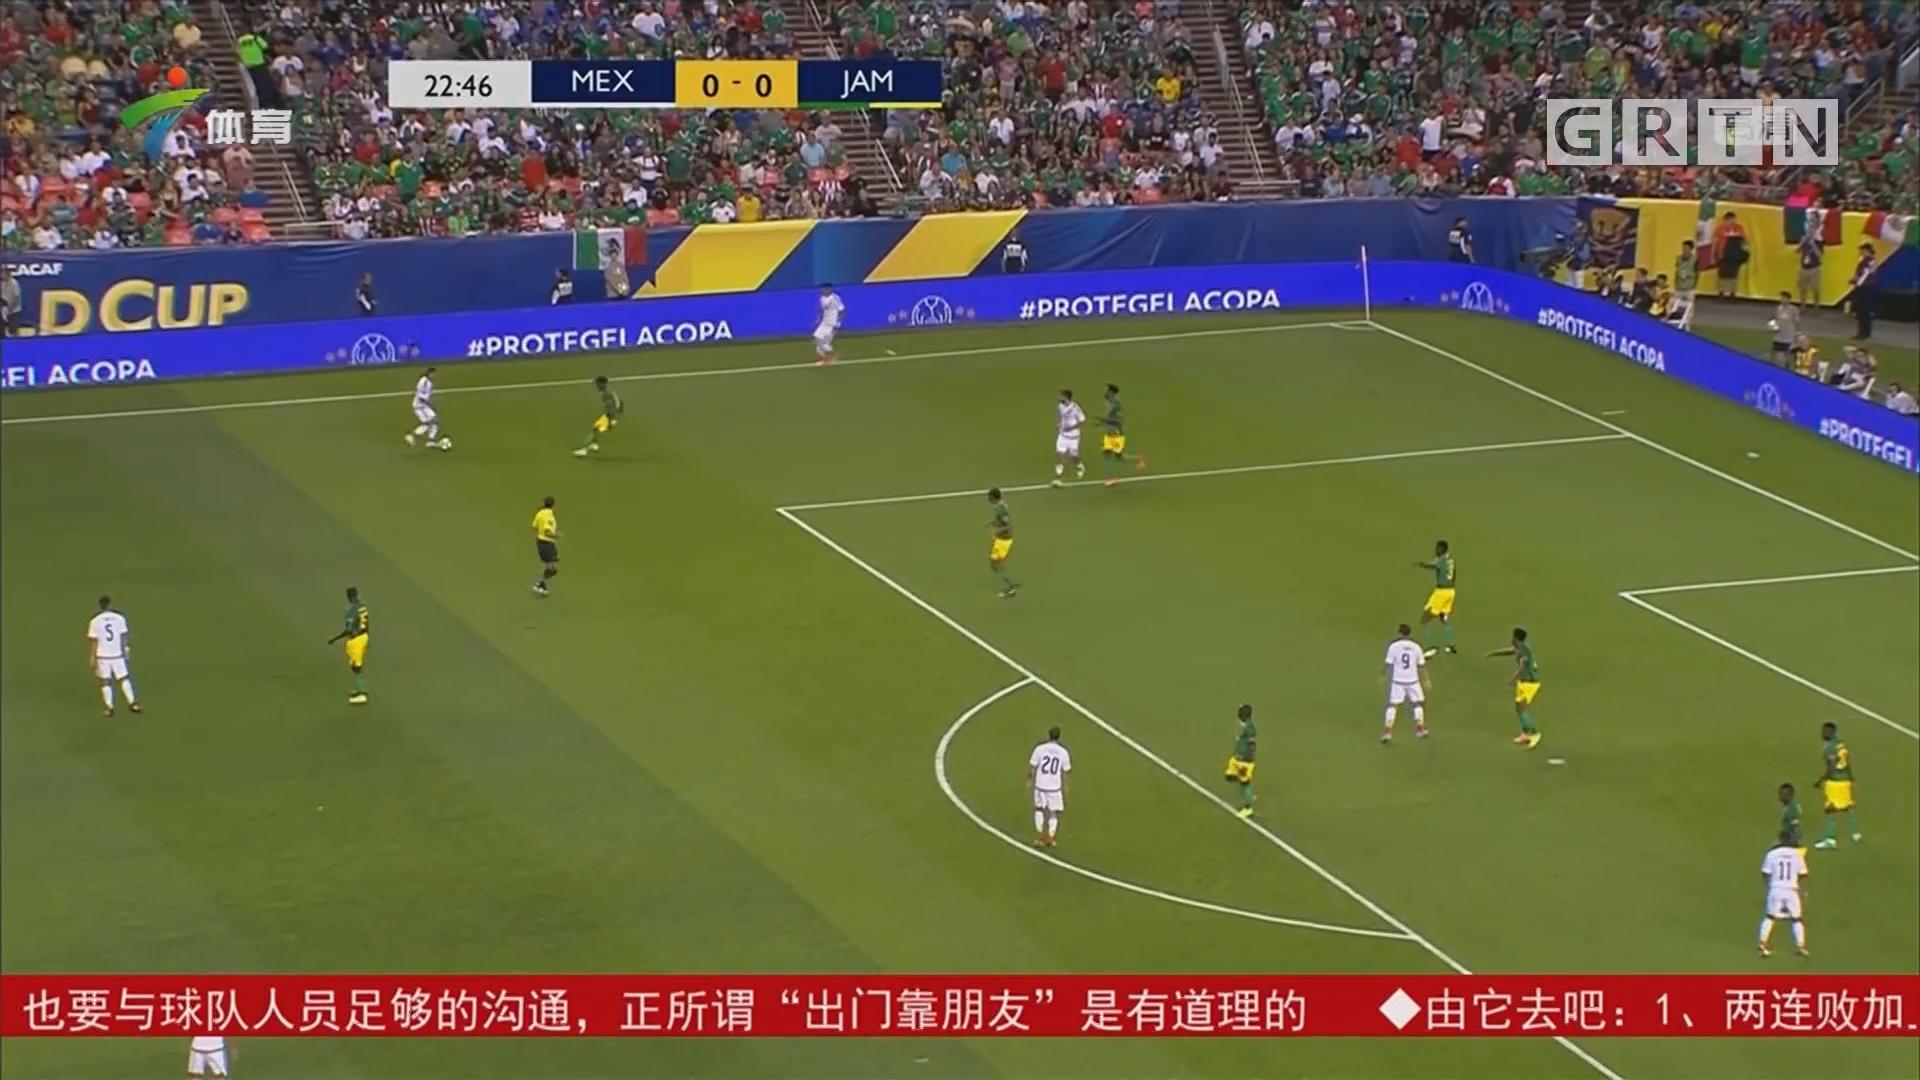 美洲金杯赛 强强对决